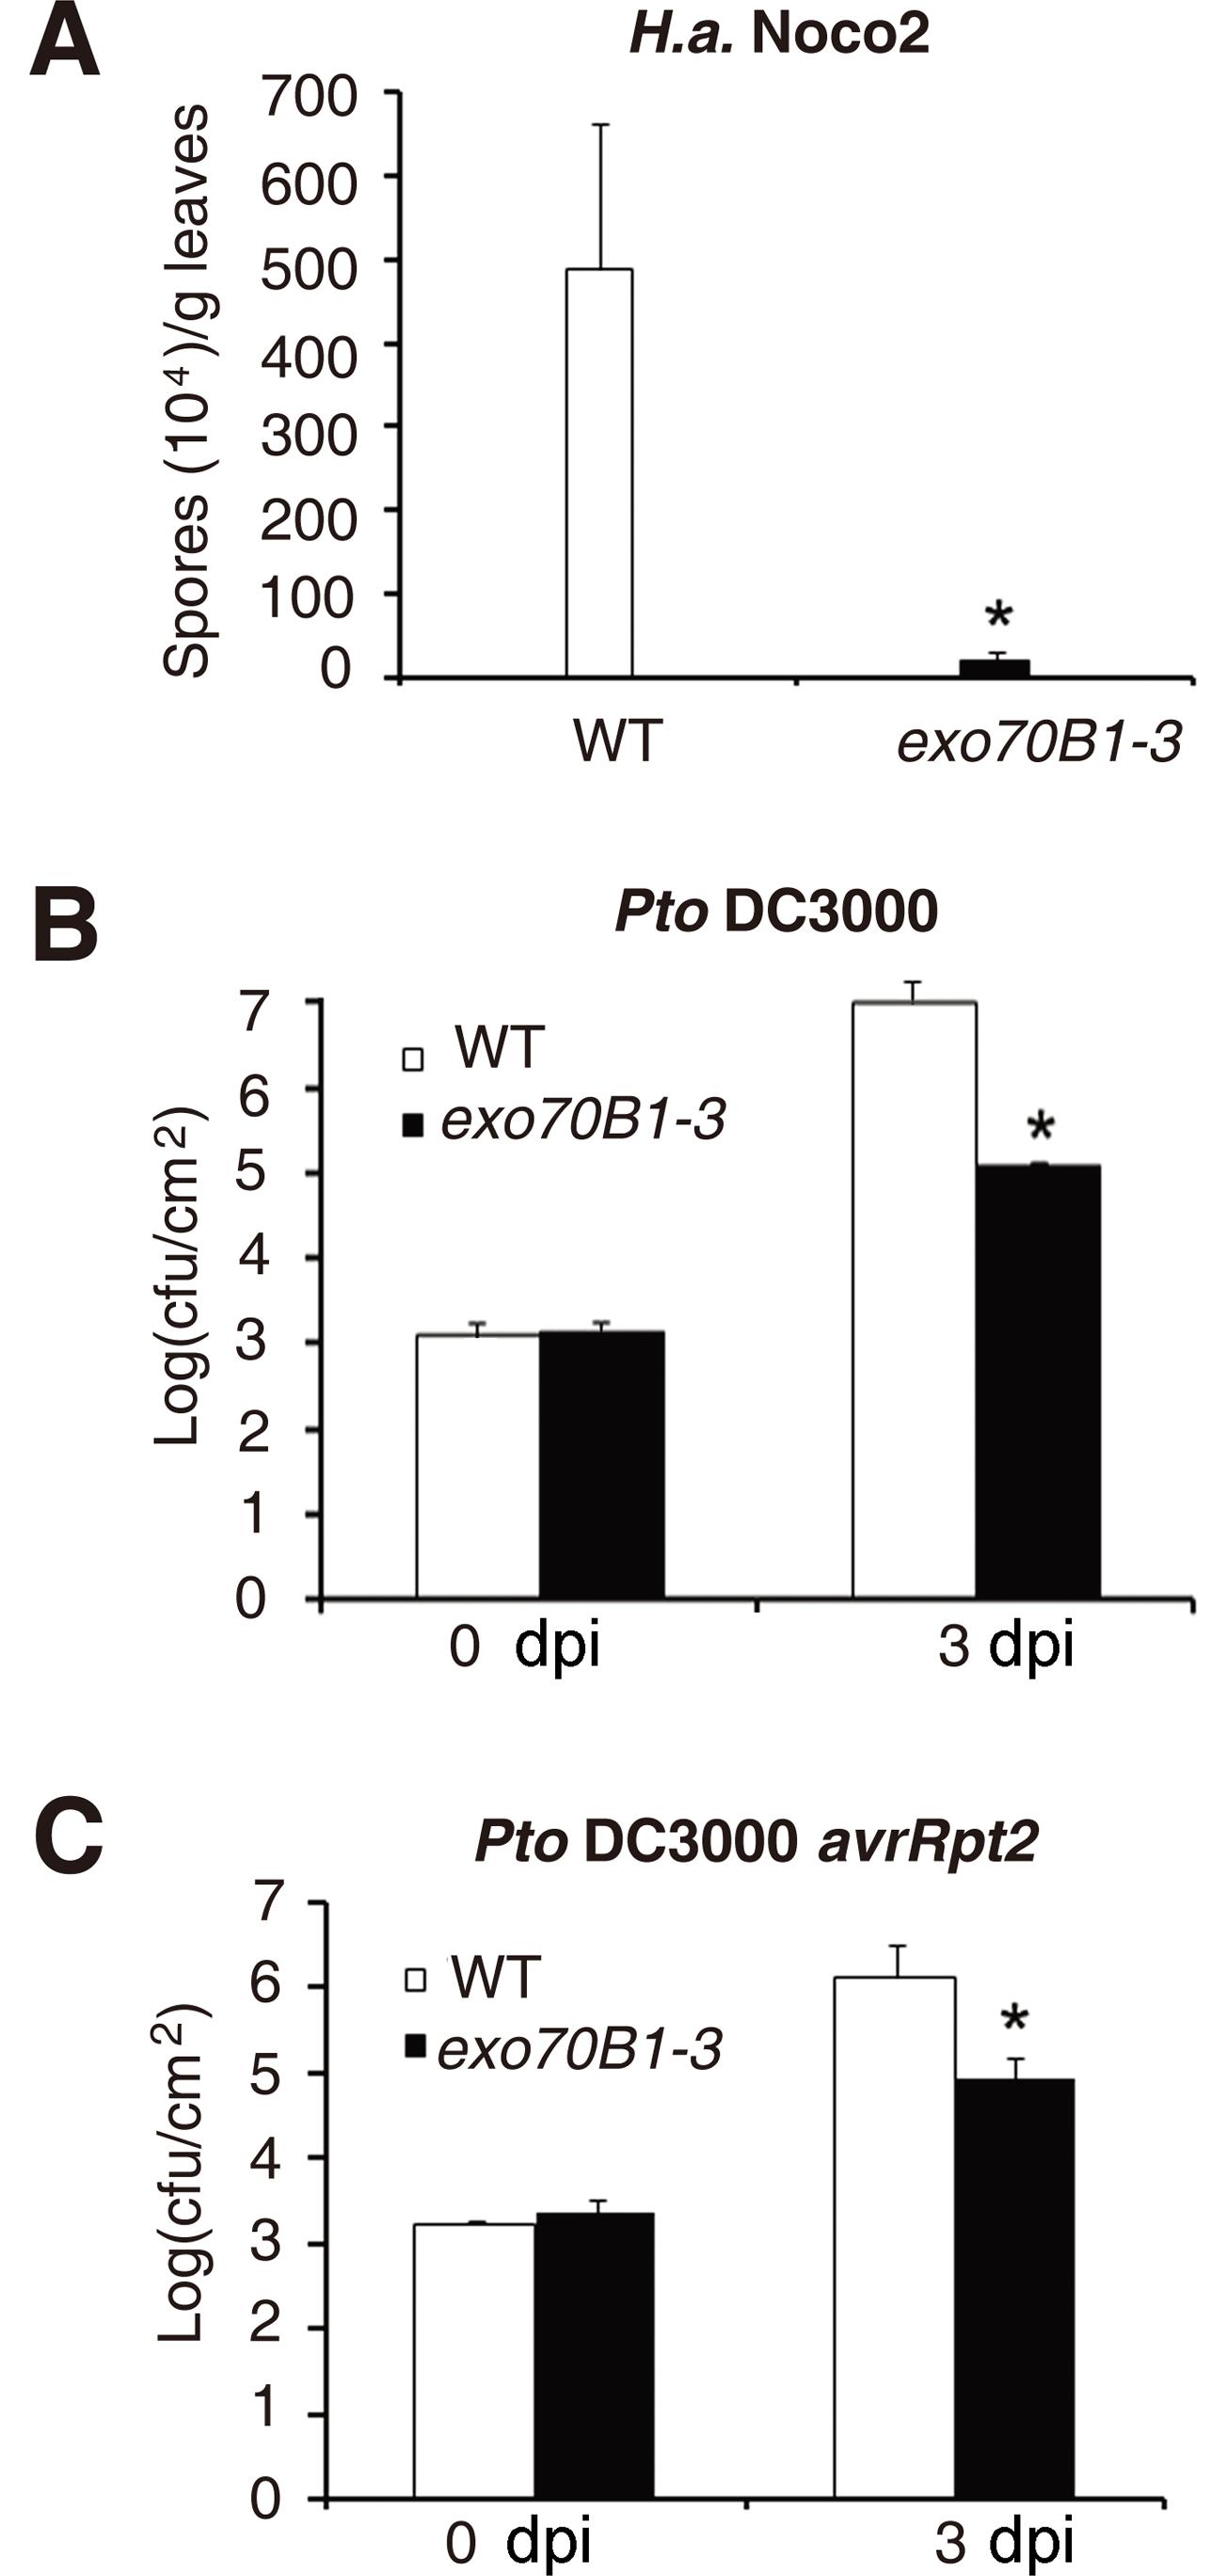 <i>exo70B1-3</i> mutants display enhanced resistance to <i>H.a.</i> Noco2, <i>Pto</i> DC3000 and <i>Pto</i> DC3000 <i>avrRpt2</i>.